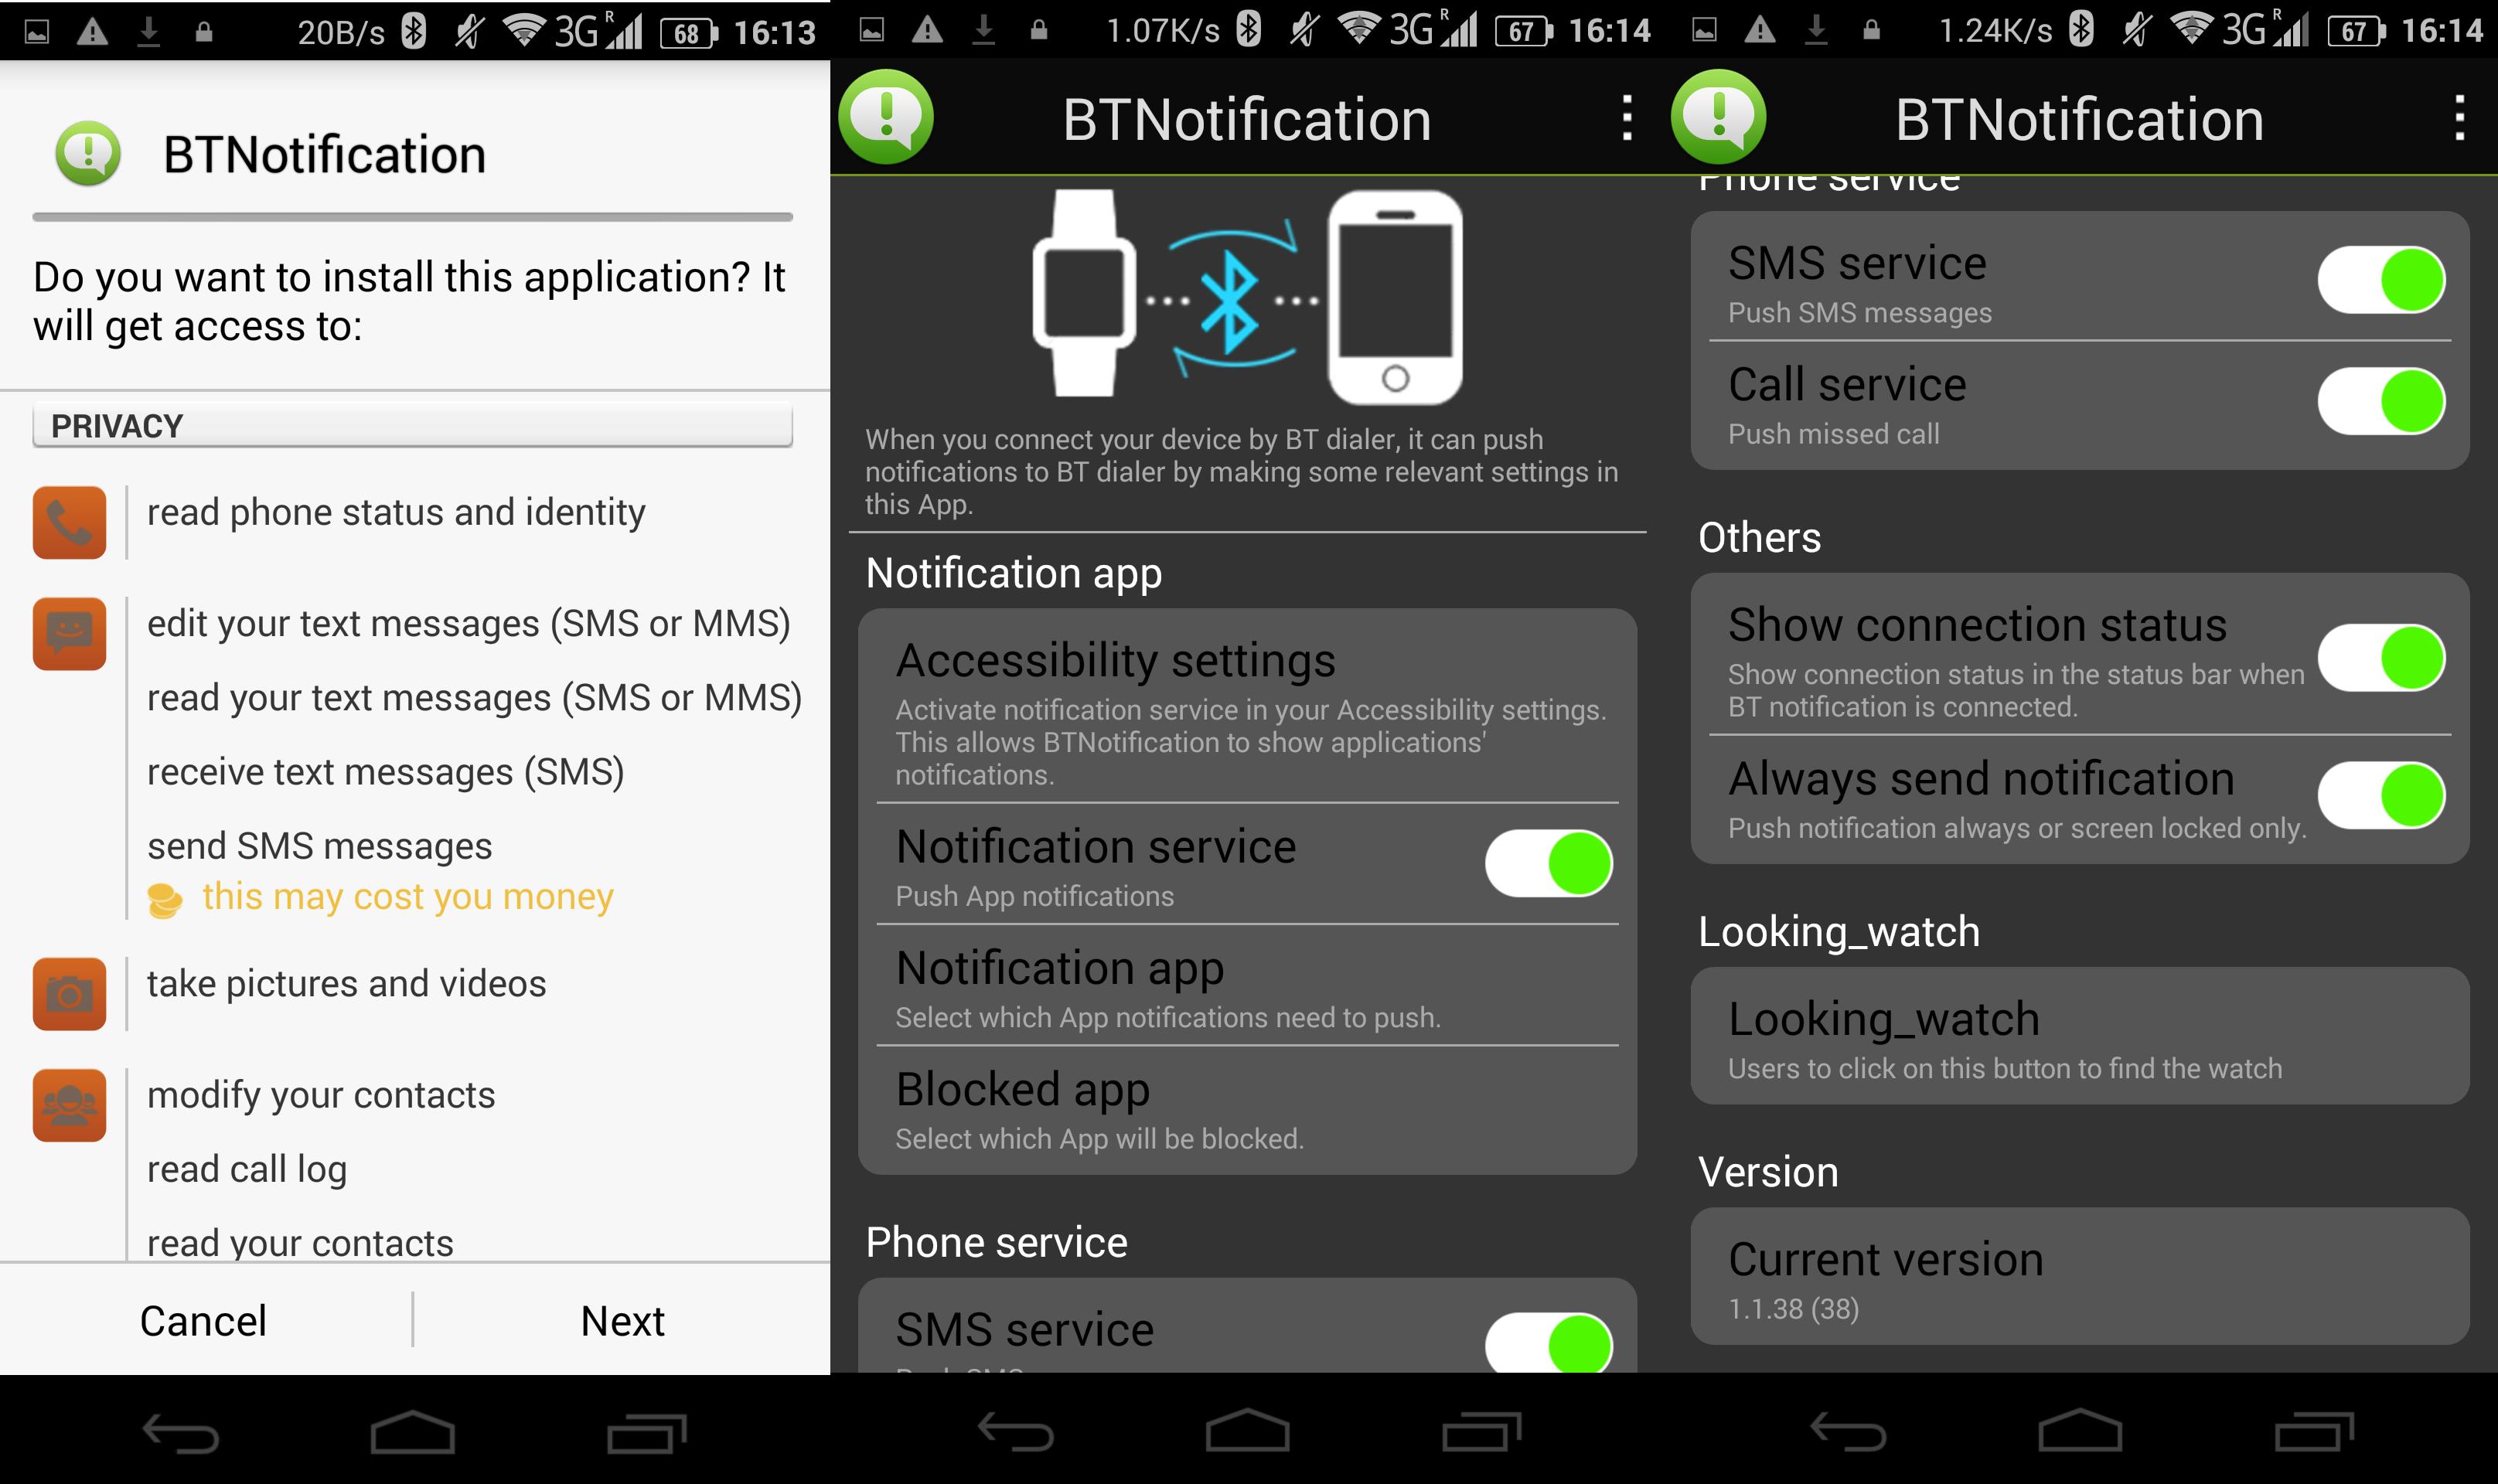 No 1 D3 Smartwatch (Mediatek MT6261) Review